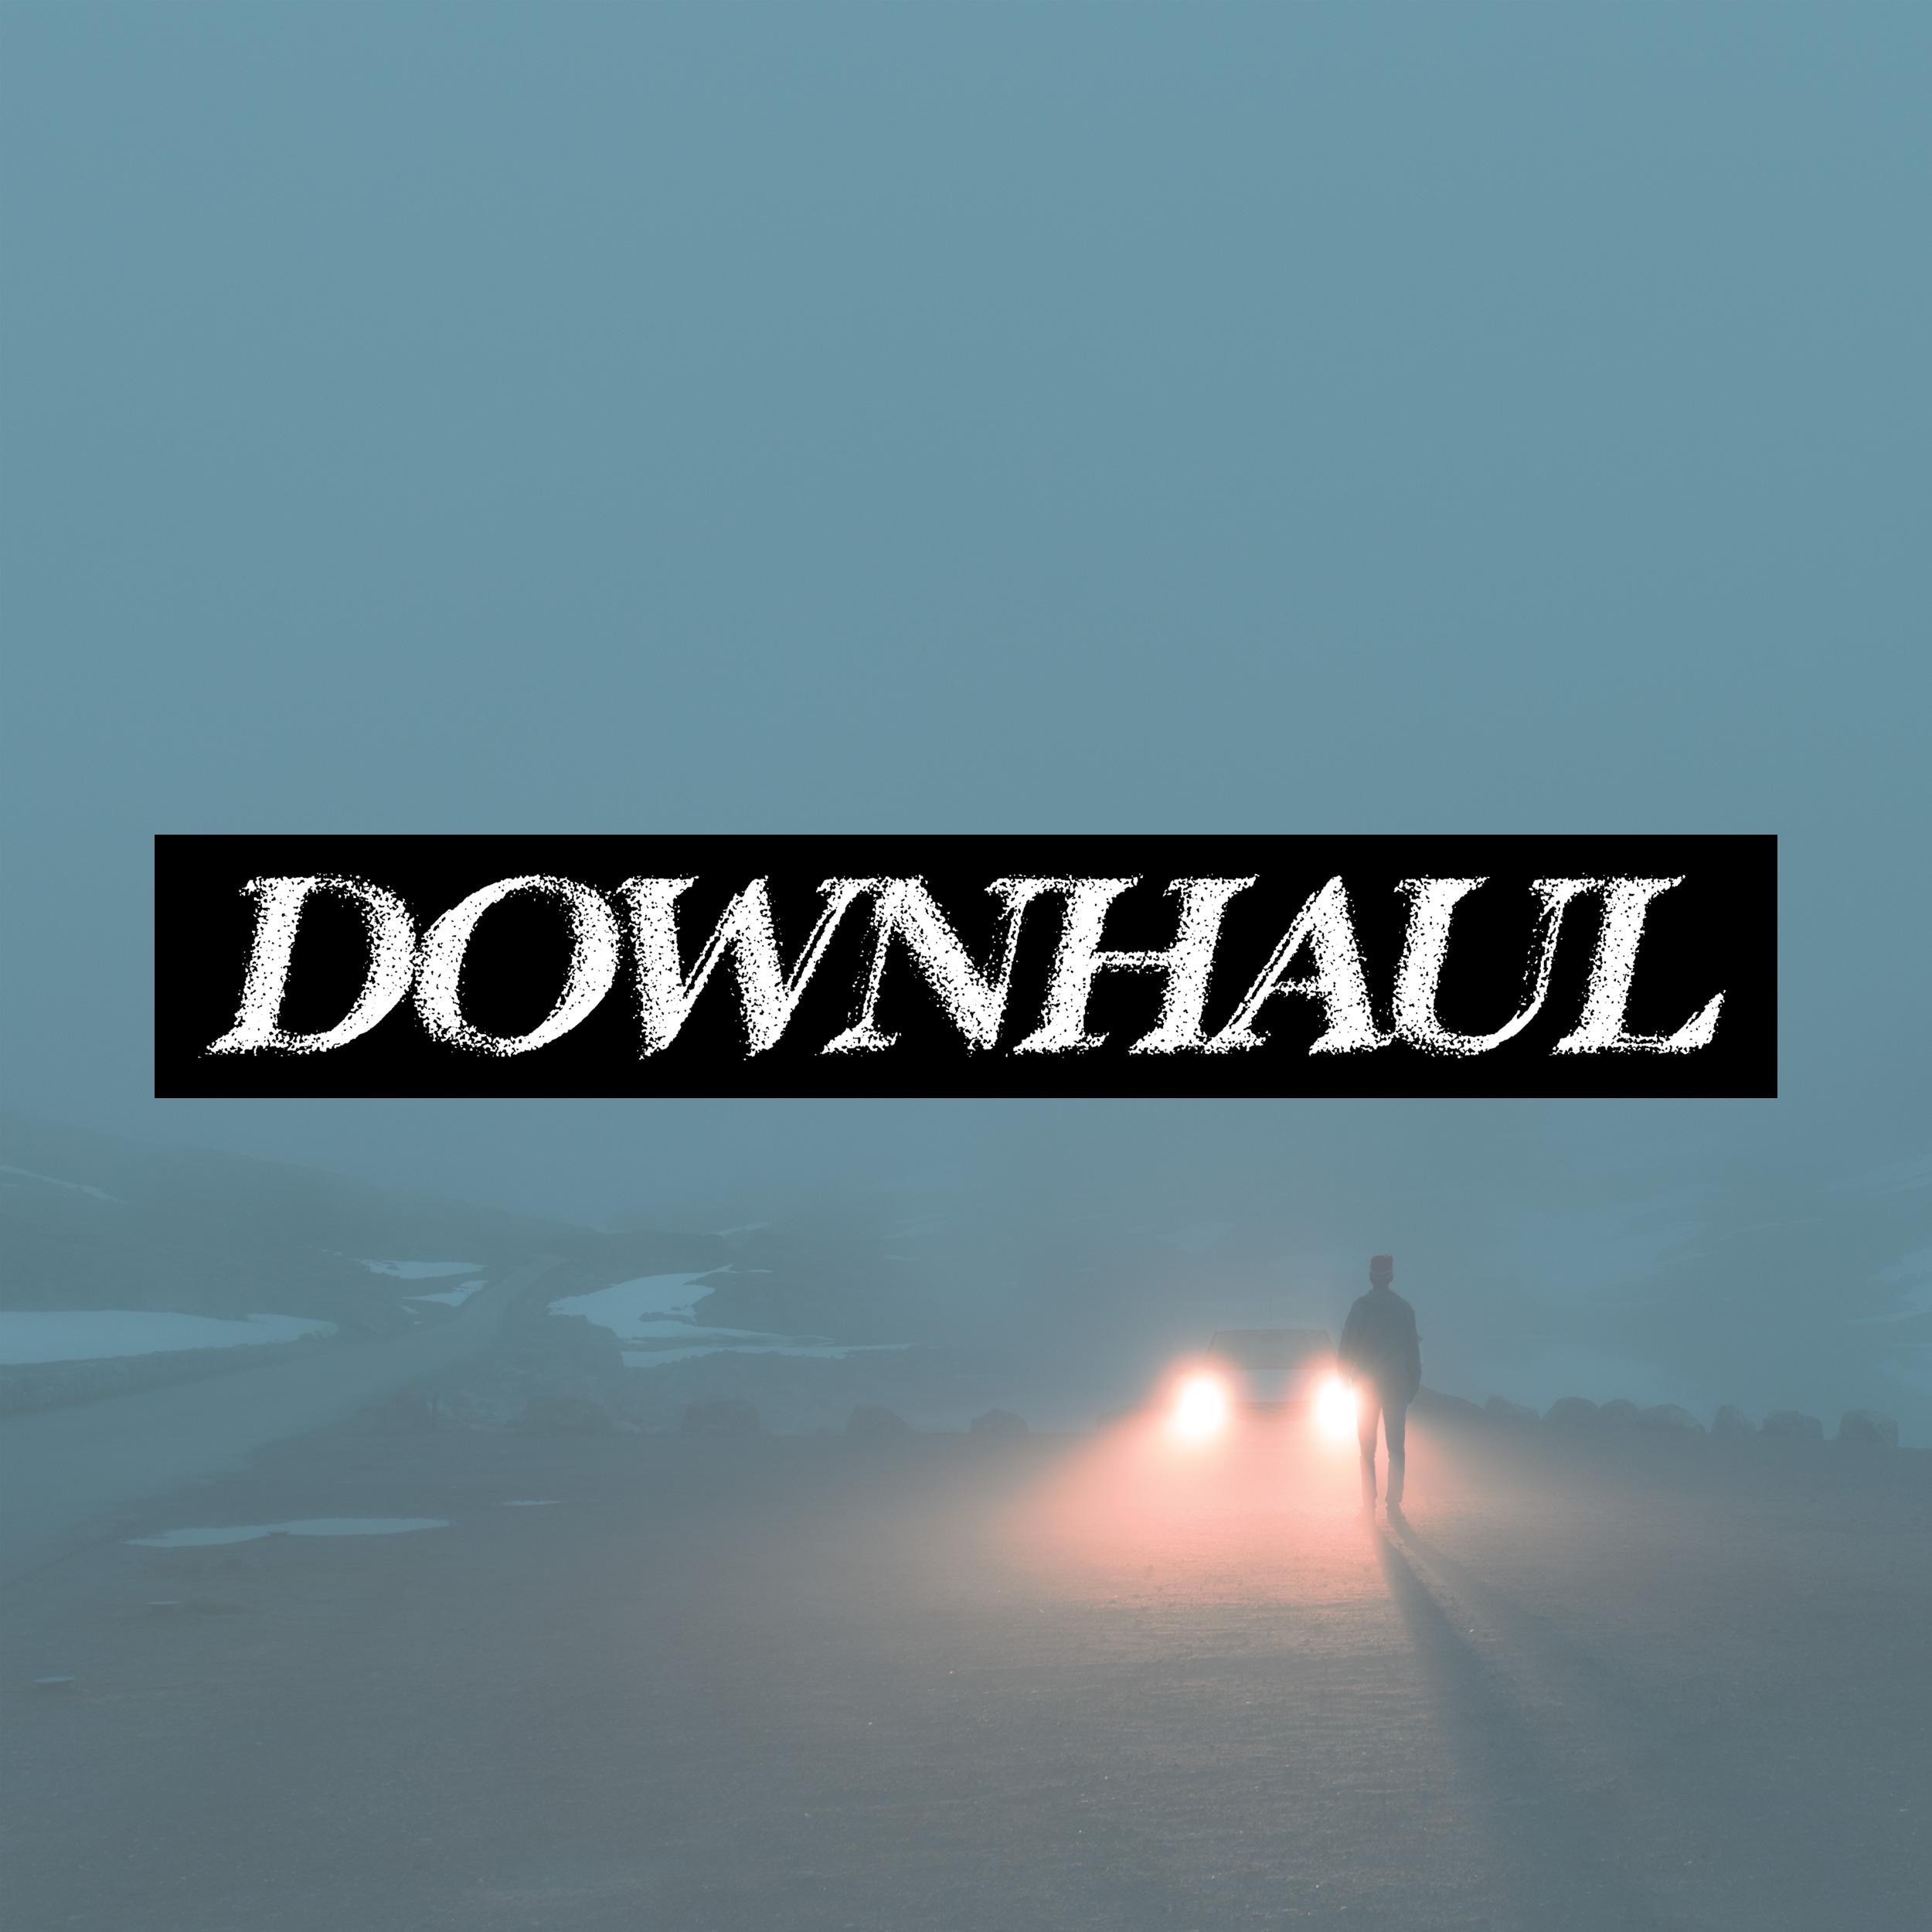 Downhaul - PROOF Sticker